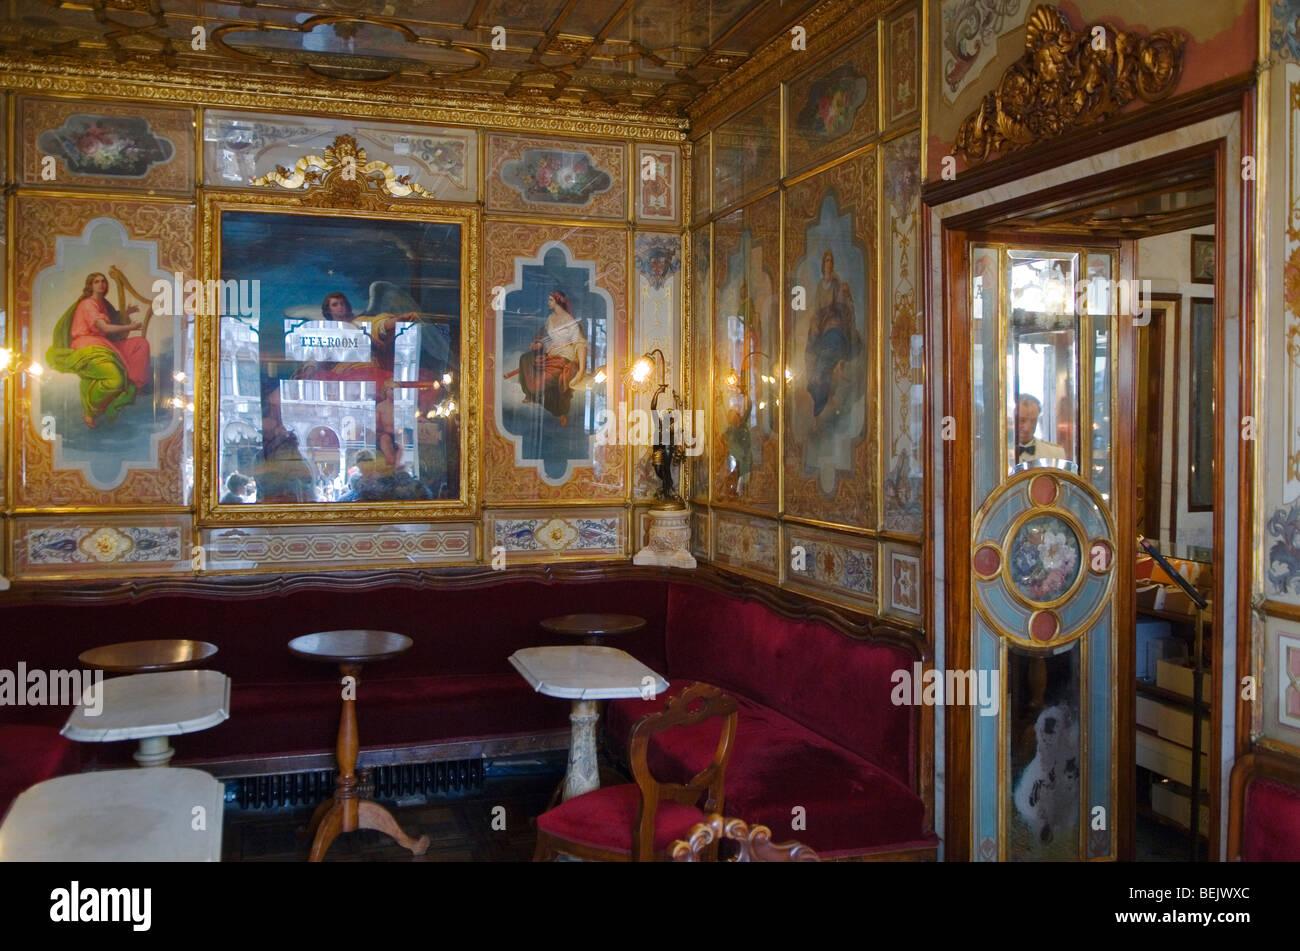 Venice Italy 2009. Florian Tea Room interior Saint Marks Square Piazza San Marco. - Stock Image